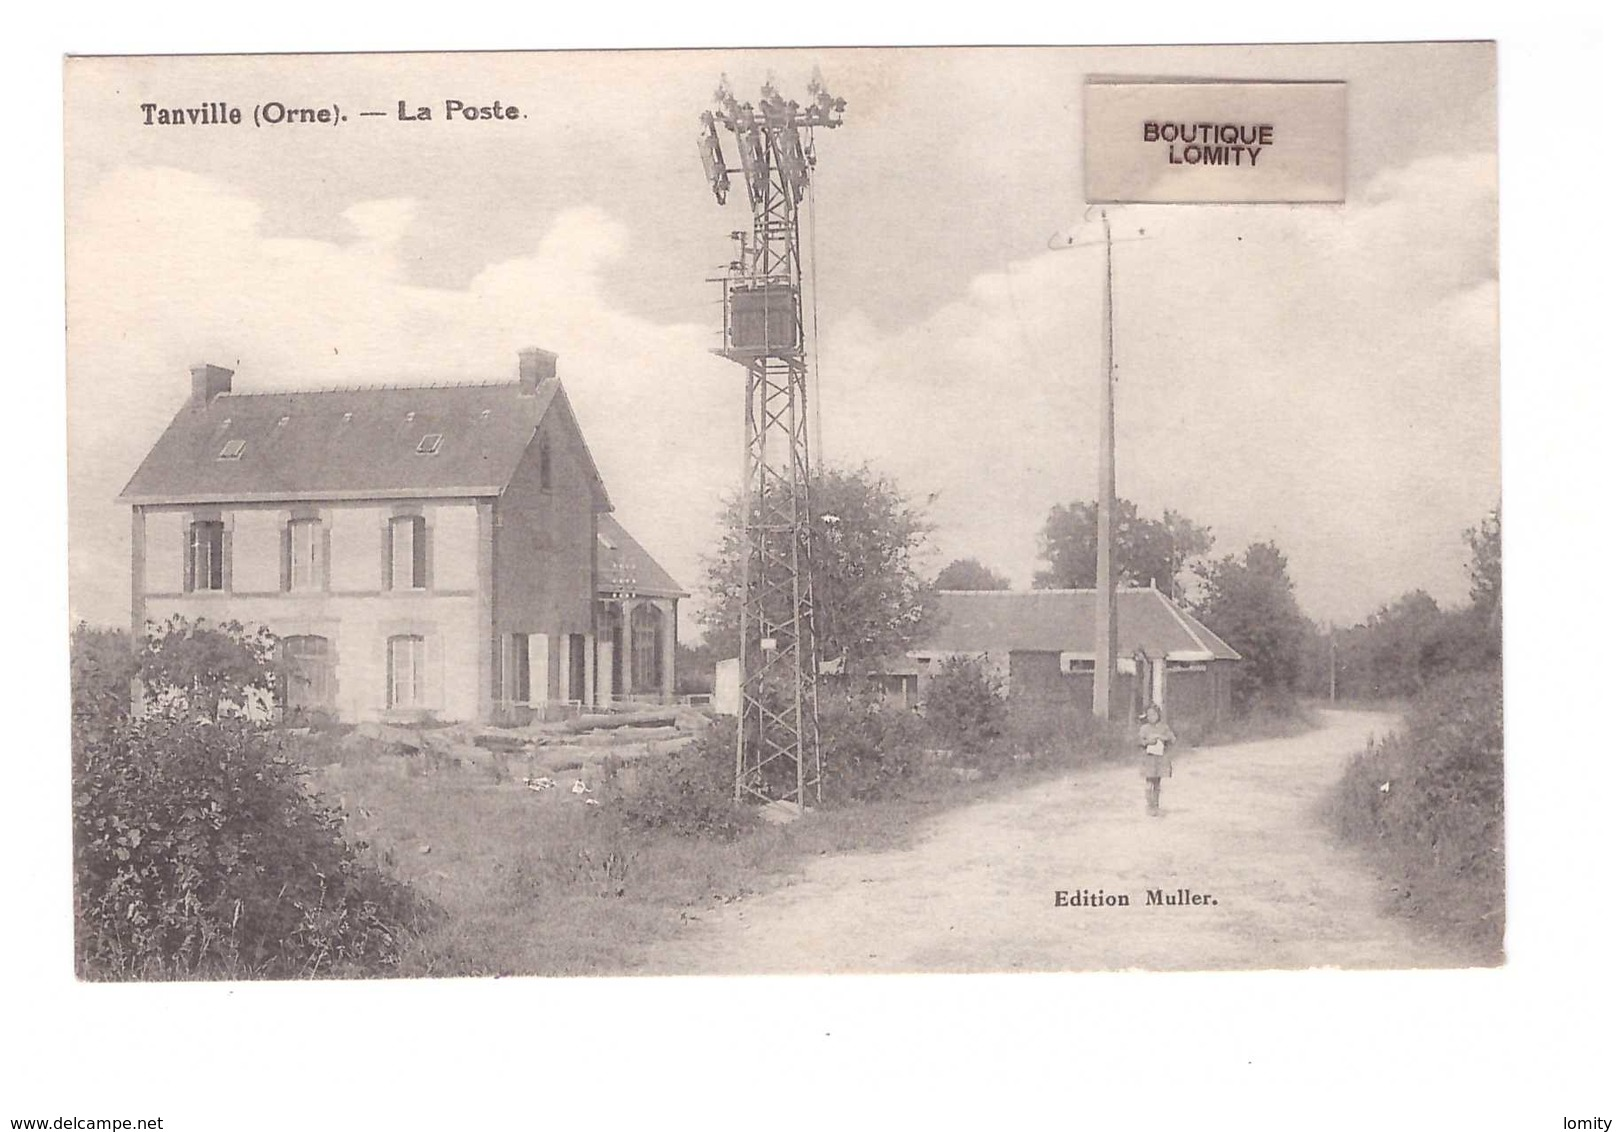 Tanville-la-poste